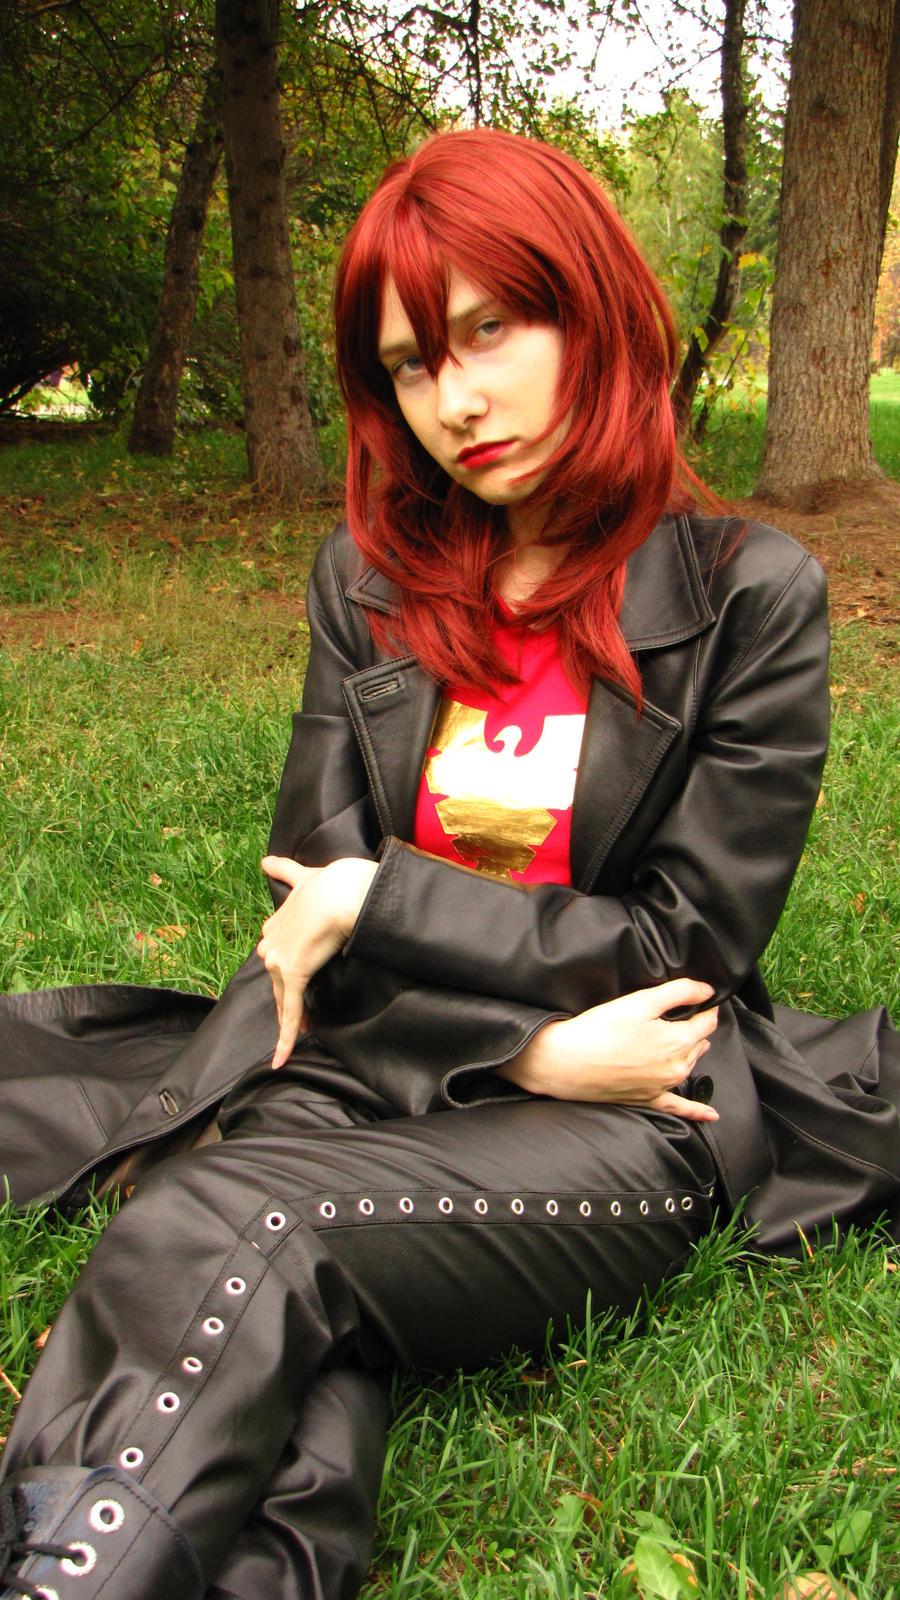 New X-Men: Jean Grey cosplay 3 by Shiera13 on DeviantArt